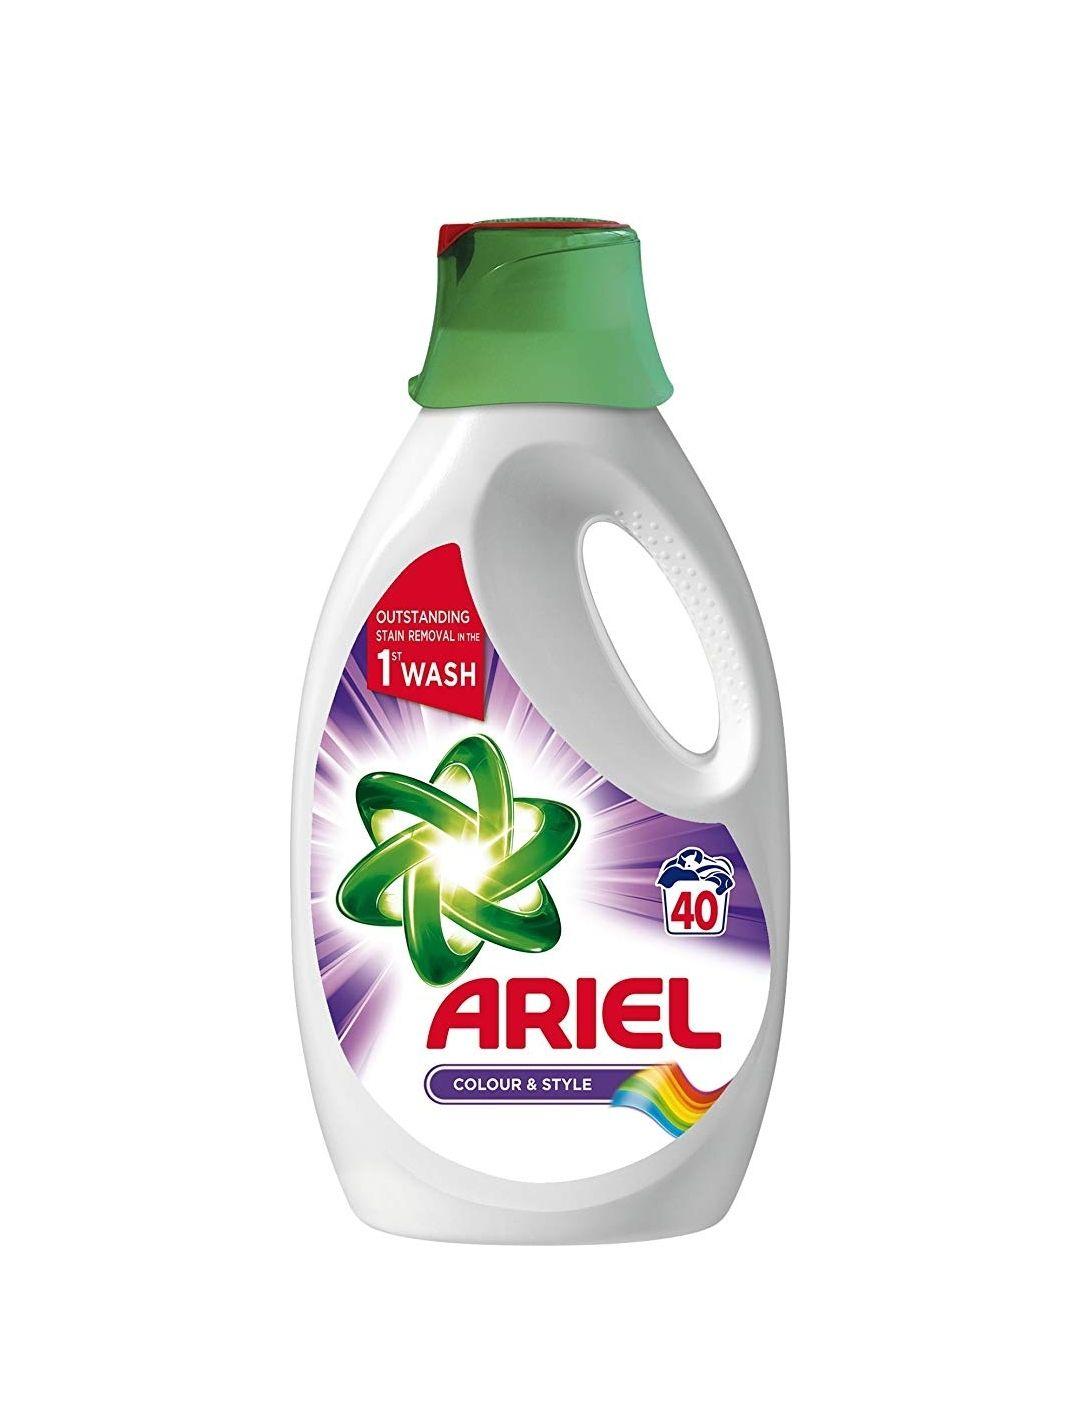 Ariel Colour 40 Washing Detergent £4.40 @ tesco instore (11p per wash)